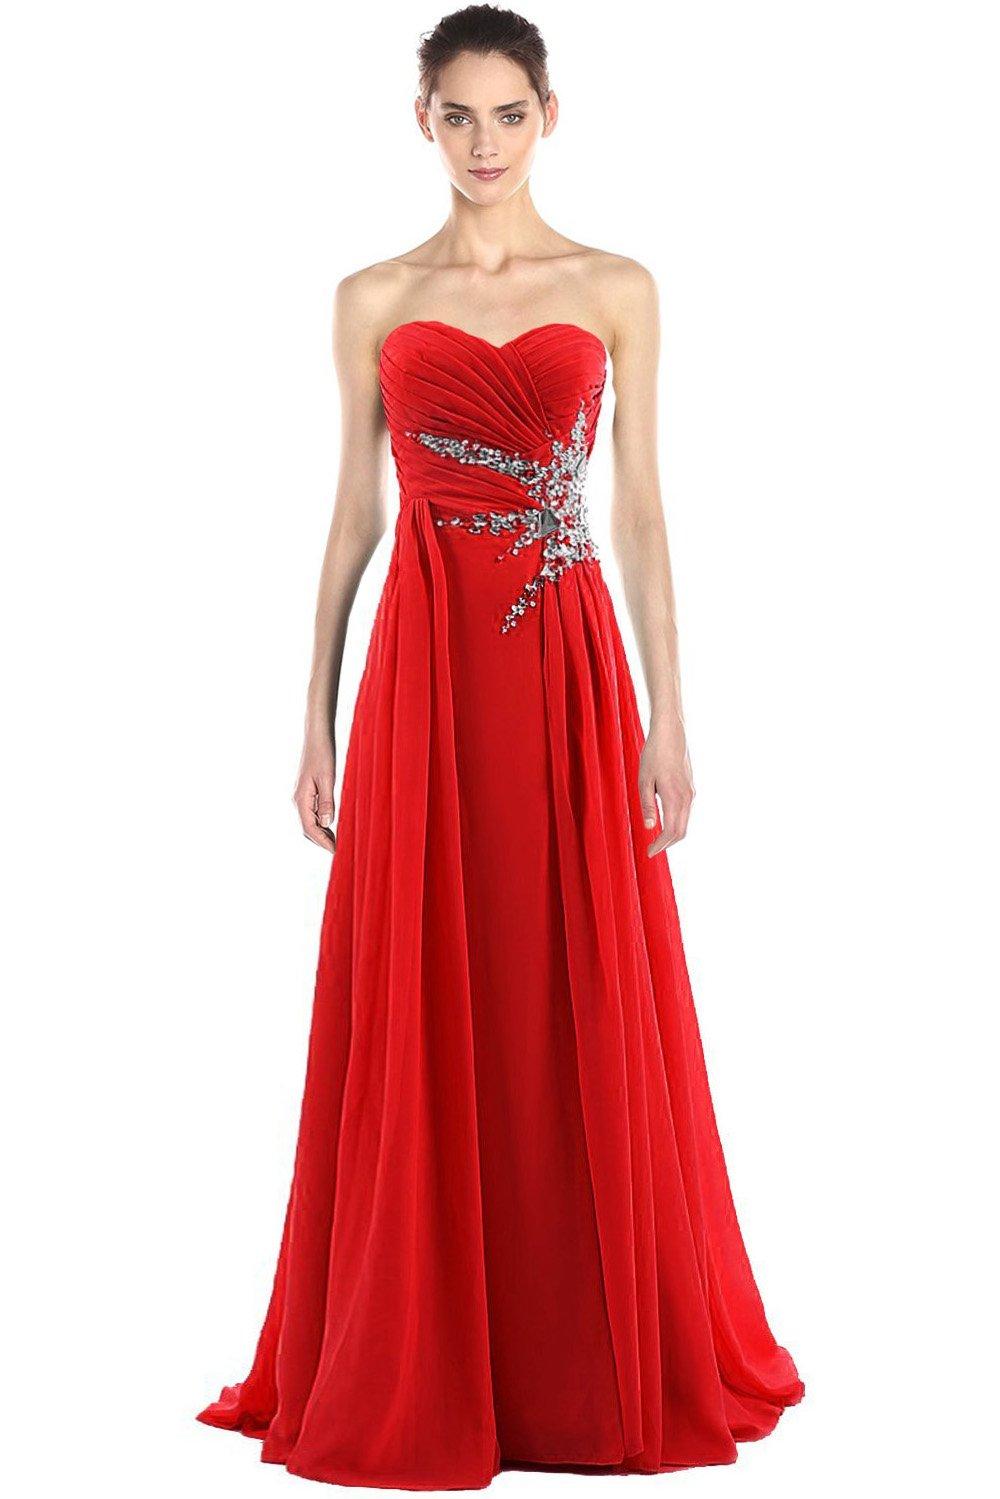 medon's Women's Sweetheart Beading Chiffon Long Prom Dress